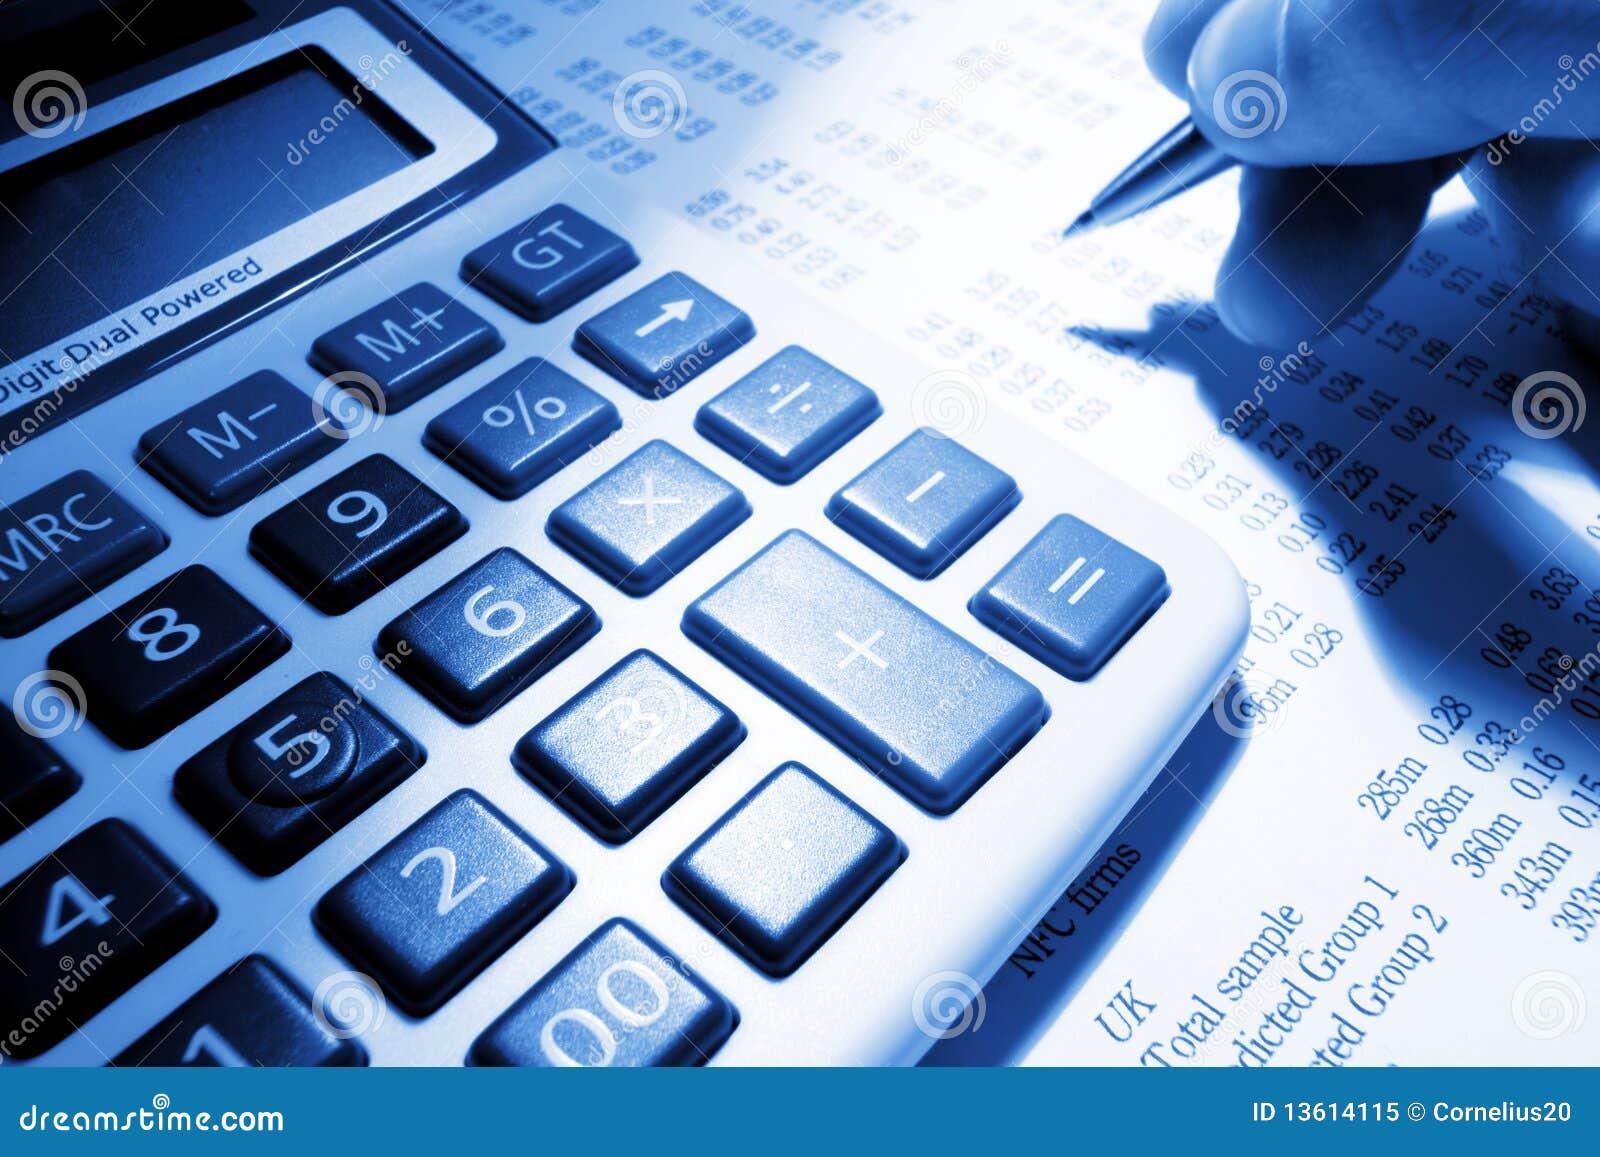 Banking Royalty Free Stock Photo - Image: 13614115